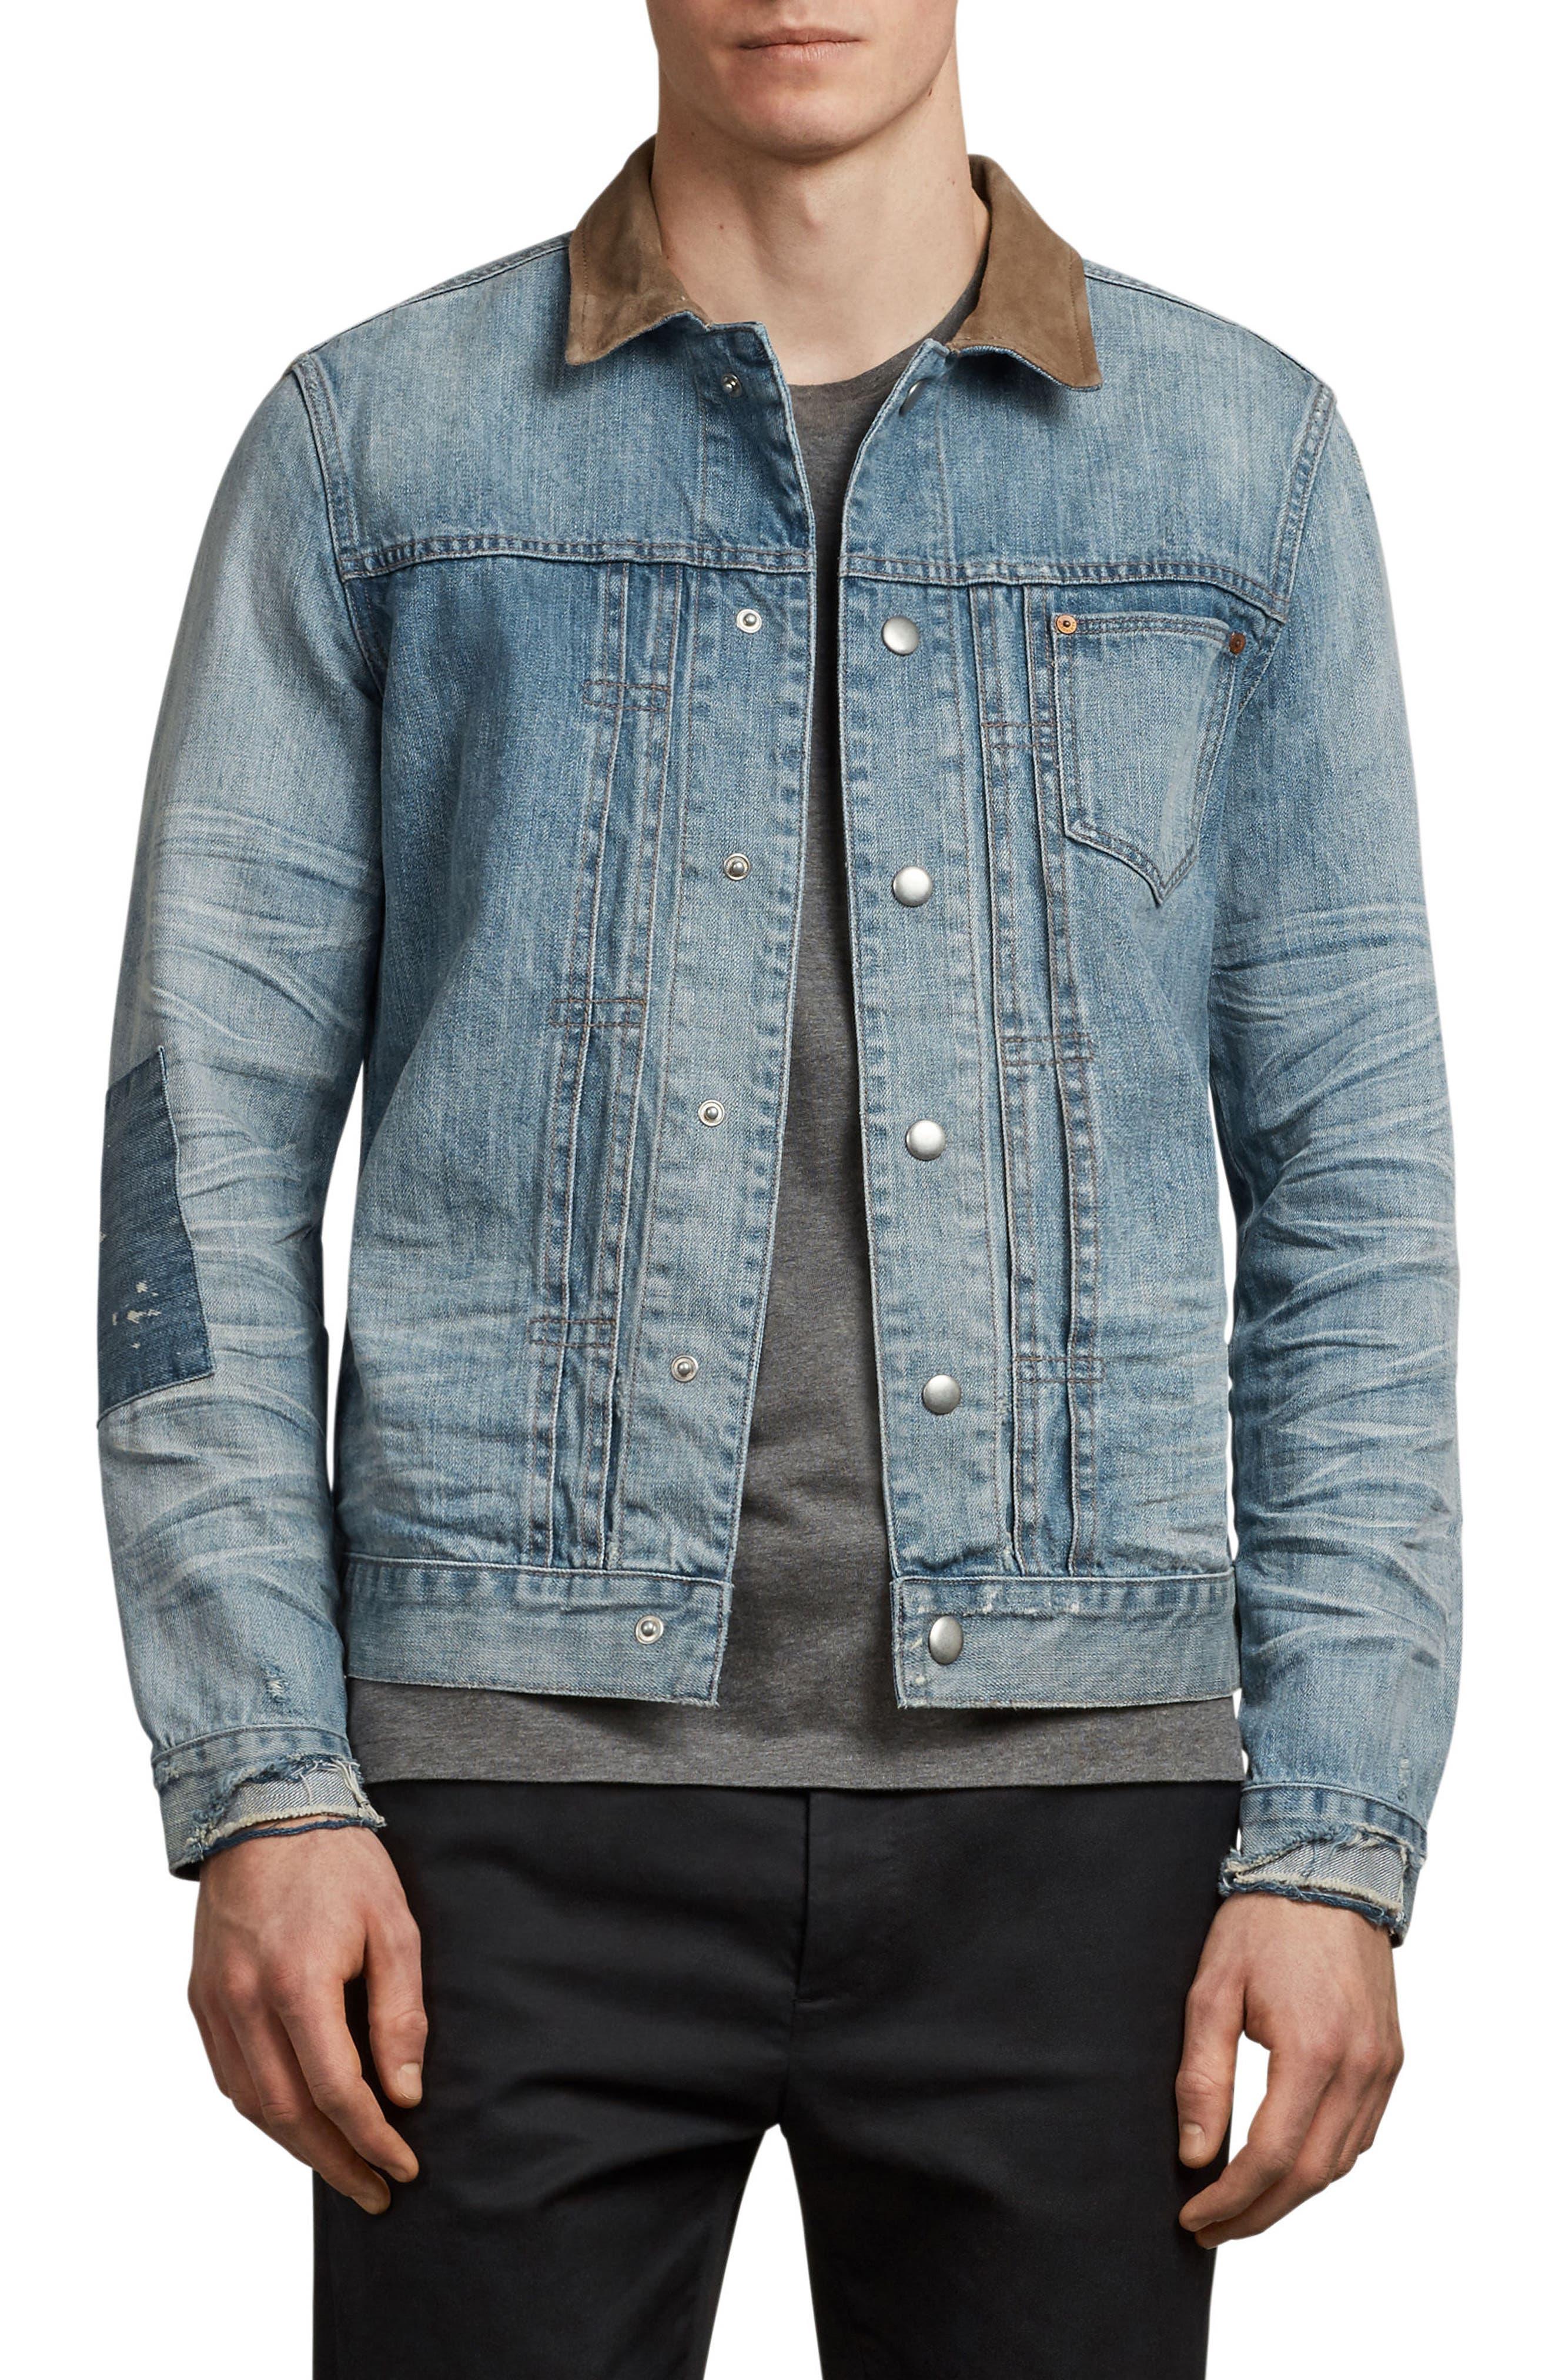 Ibanex Slim Fit Distressed Denim Jacket,                         Main,                         color, 460